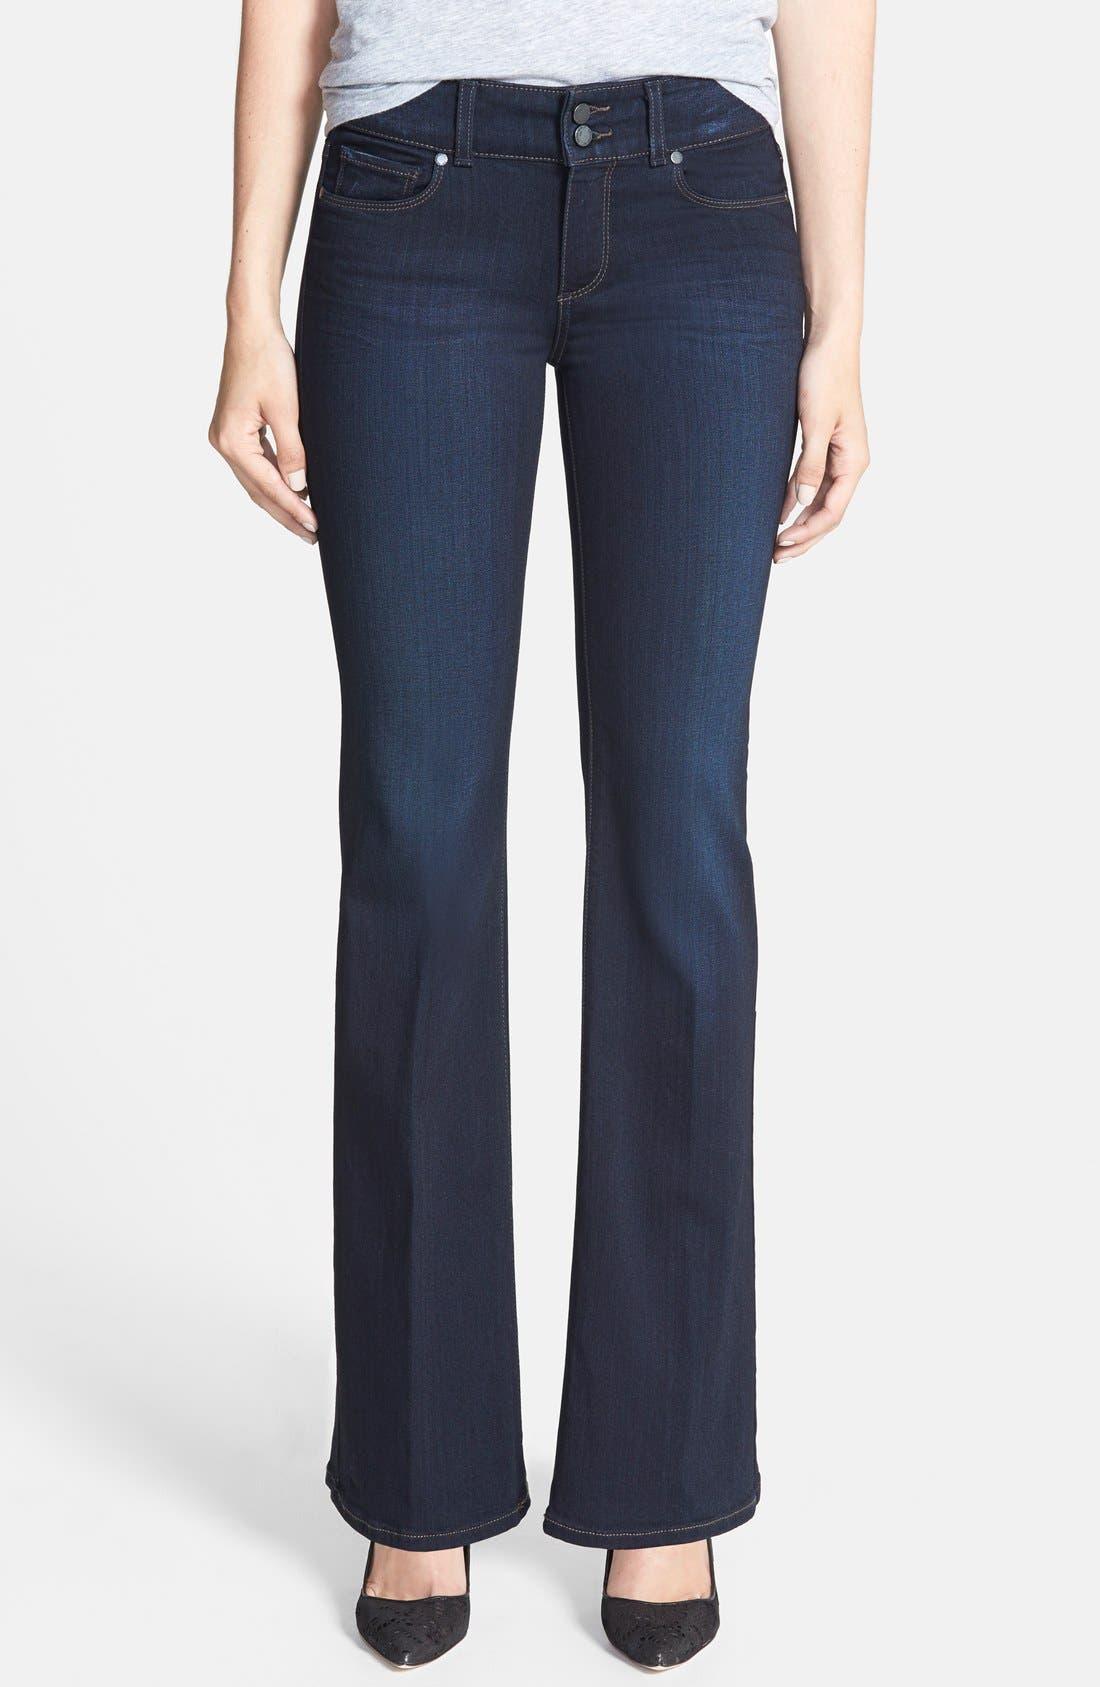 Alternate Image 1 Selected - PAIGE 'Transcend - Hidden Hills' Bootcut Stretch Jeans (Mona) (Petite)